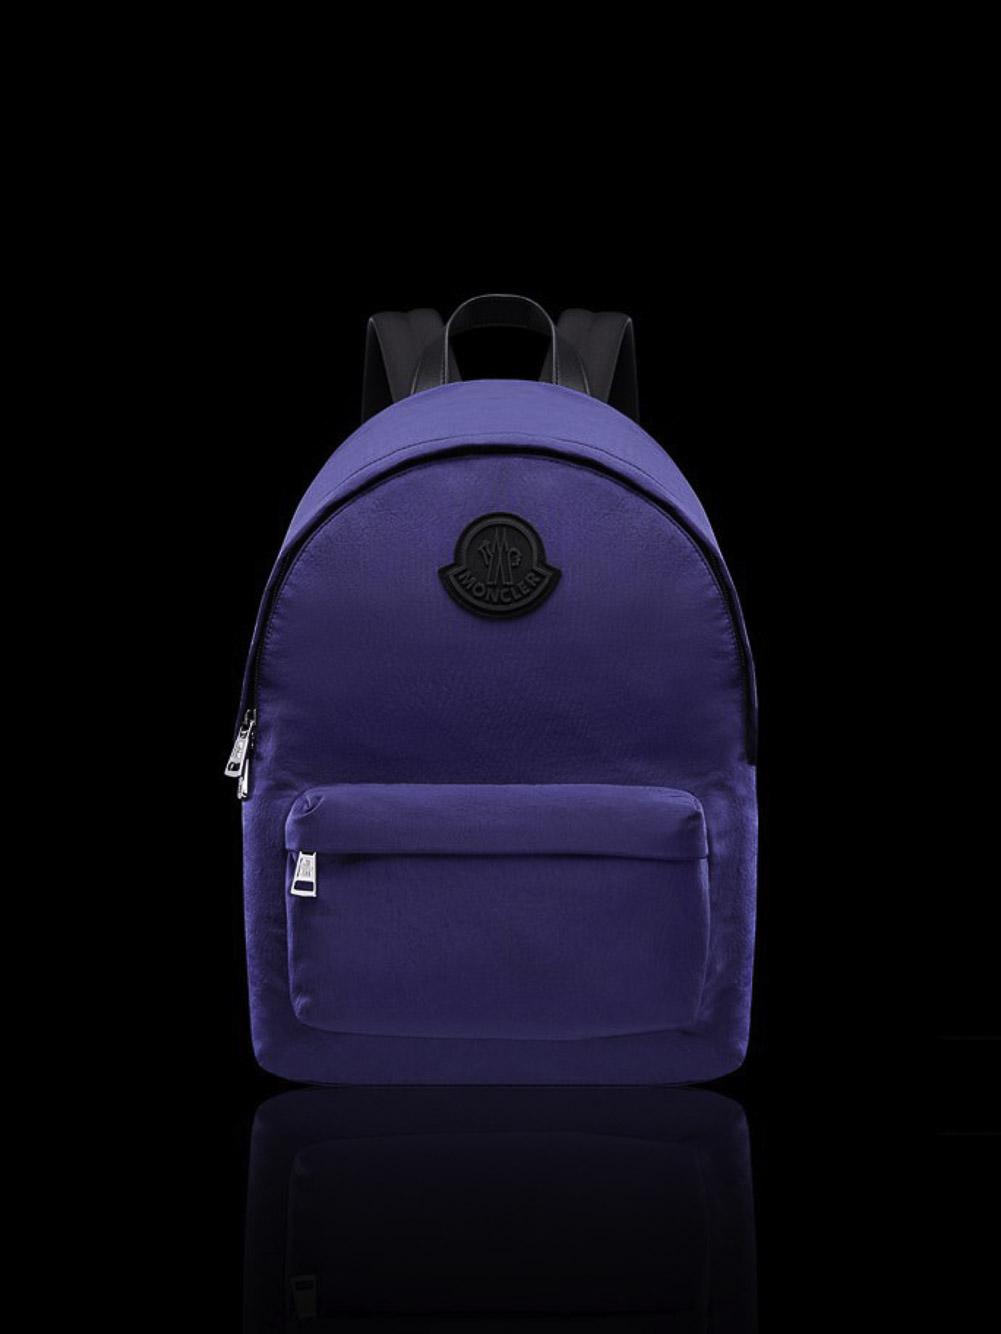 MONCLER Τσάντα Back Pack 09A5A7040002SSX-760 ΡΟΥΑ